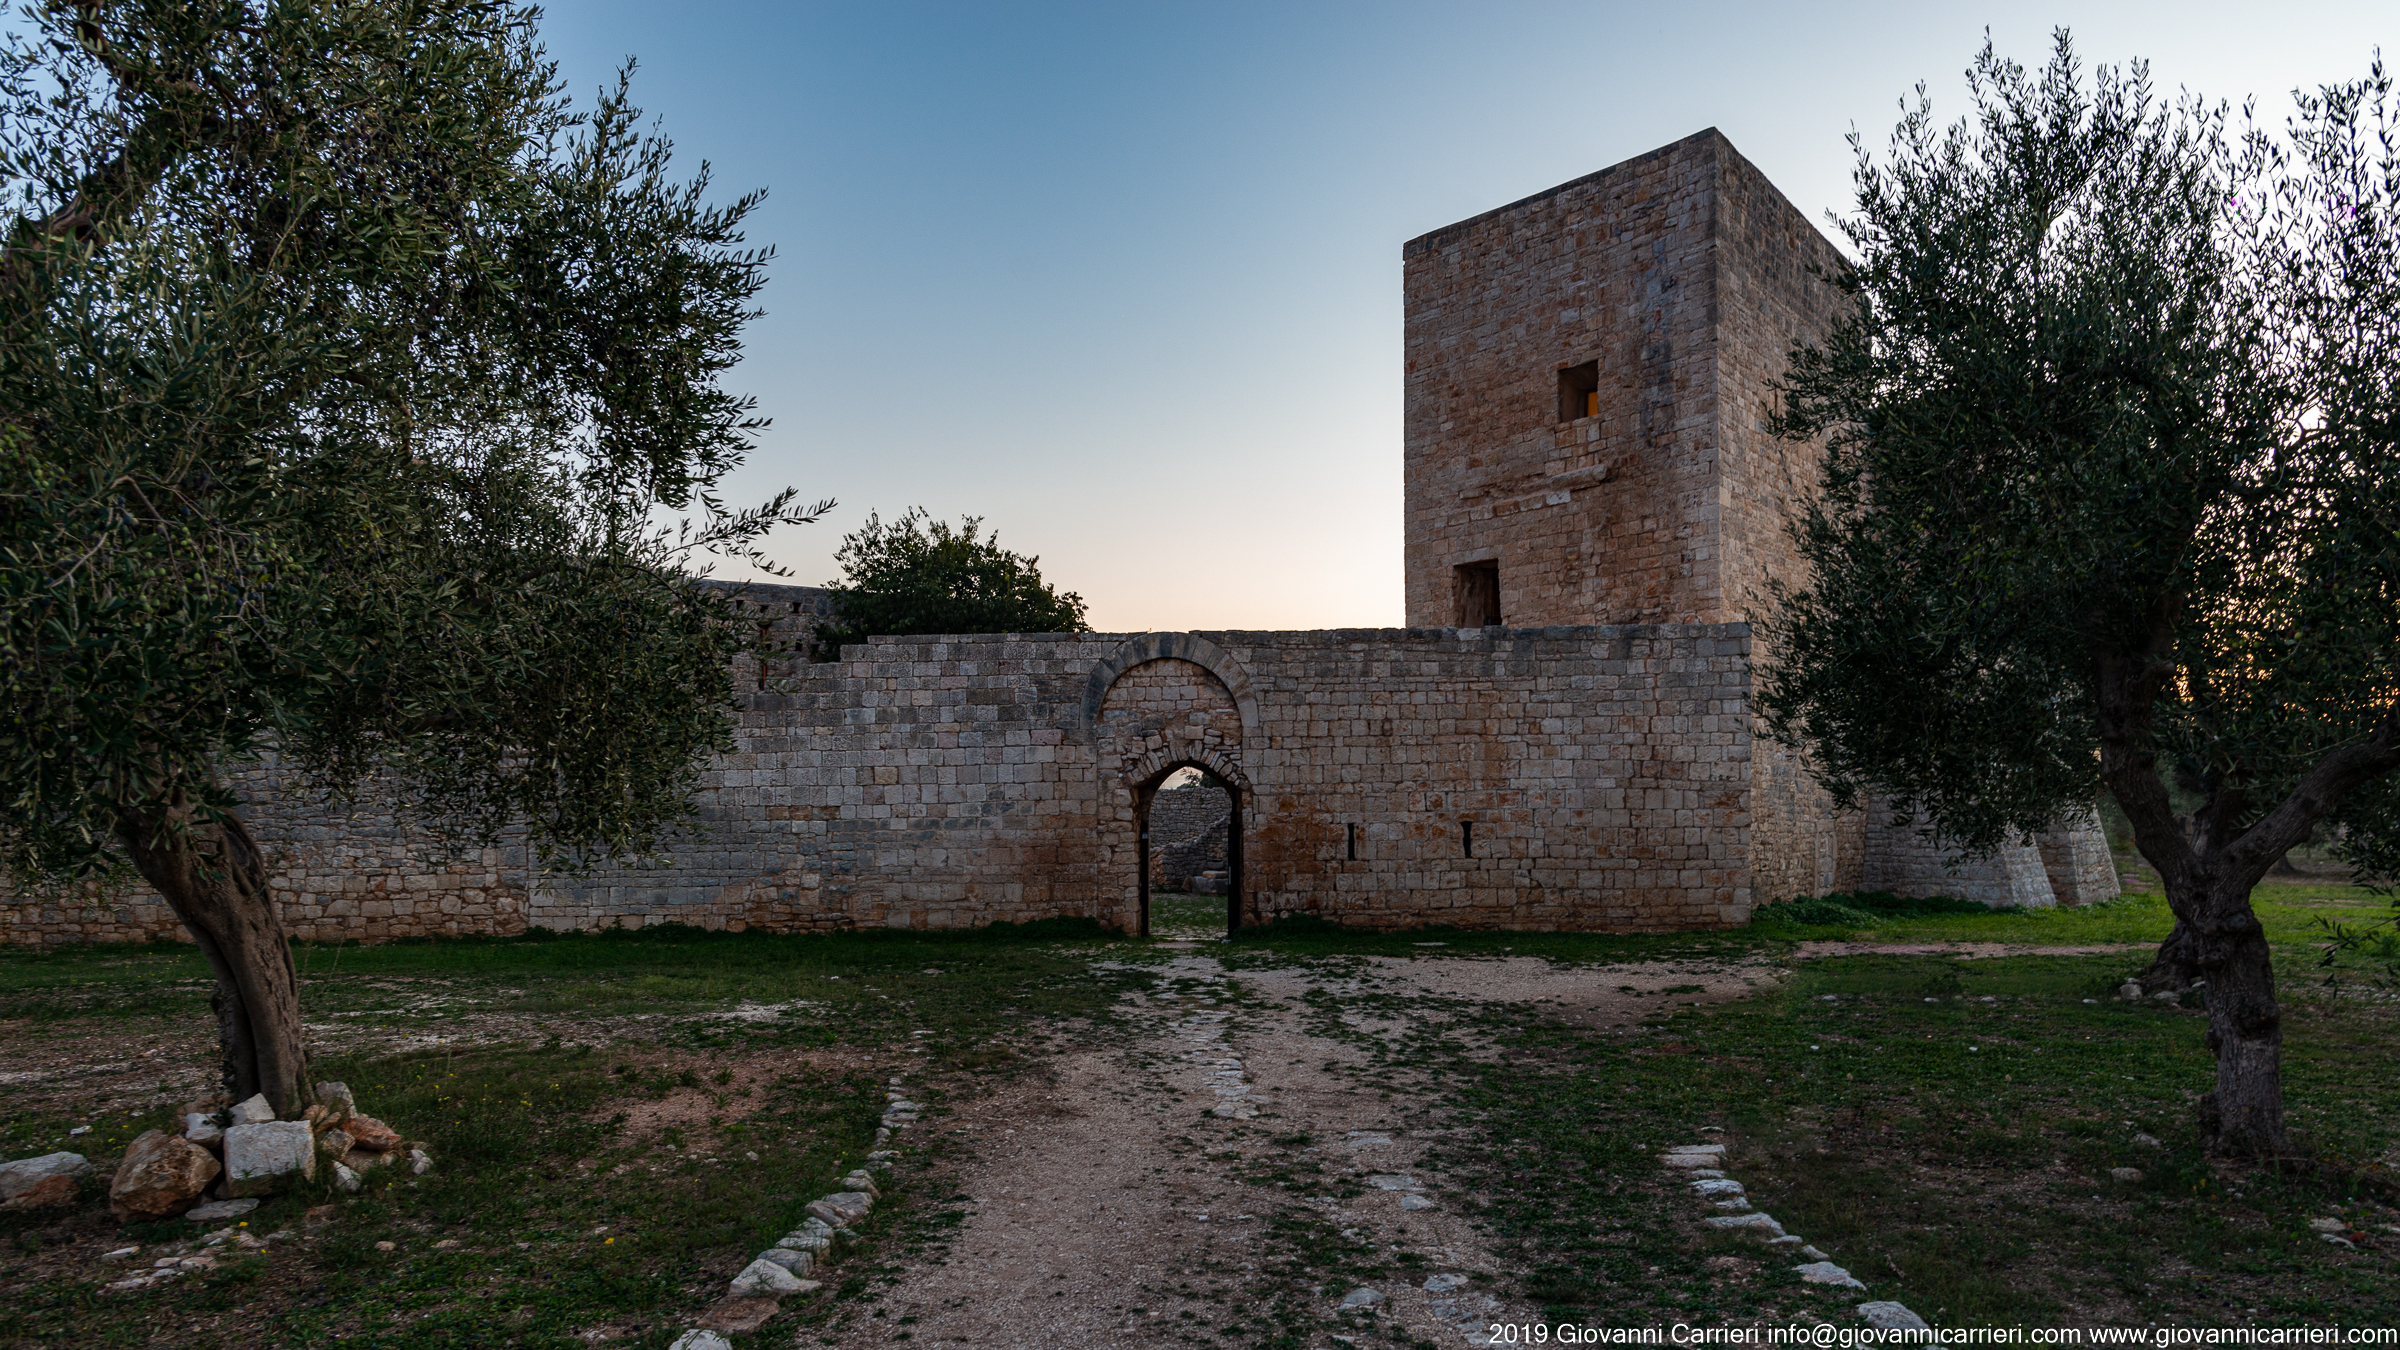 Internal fortification